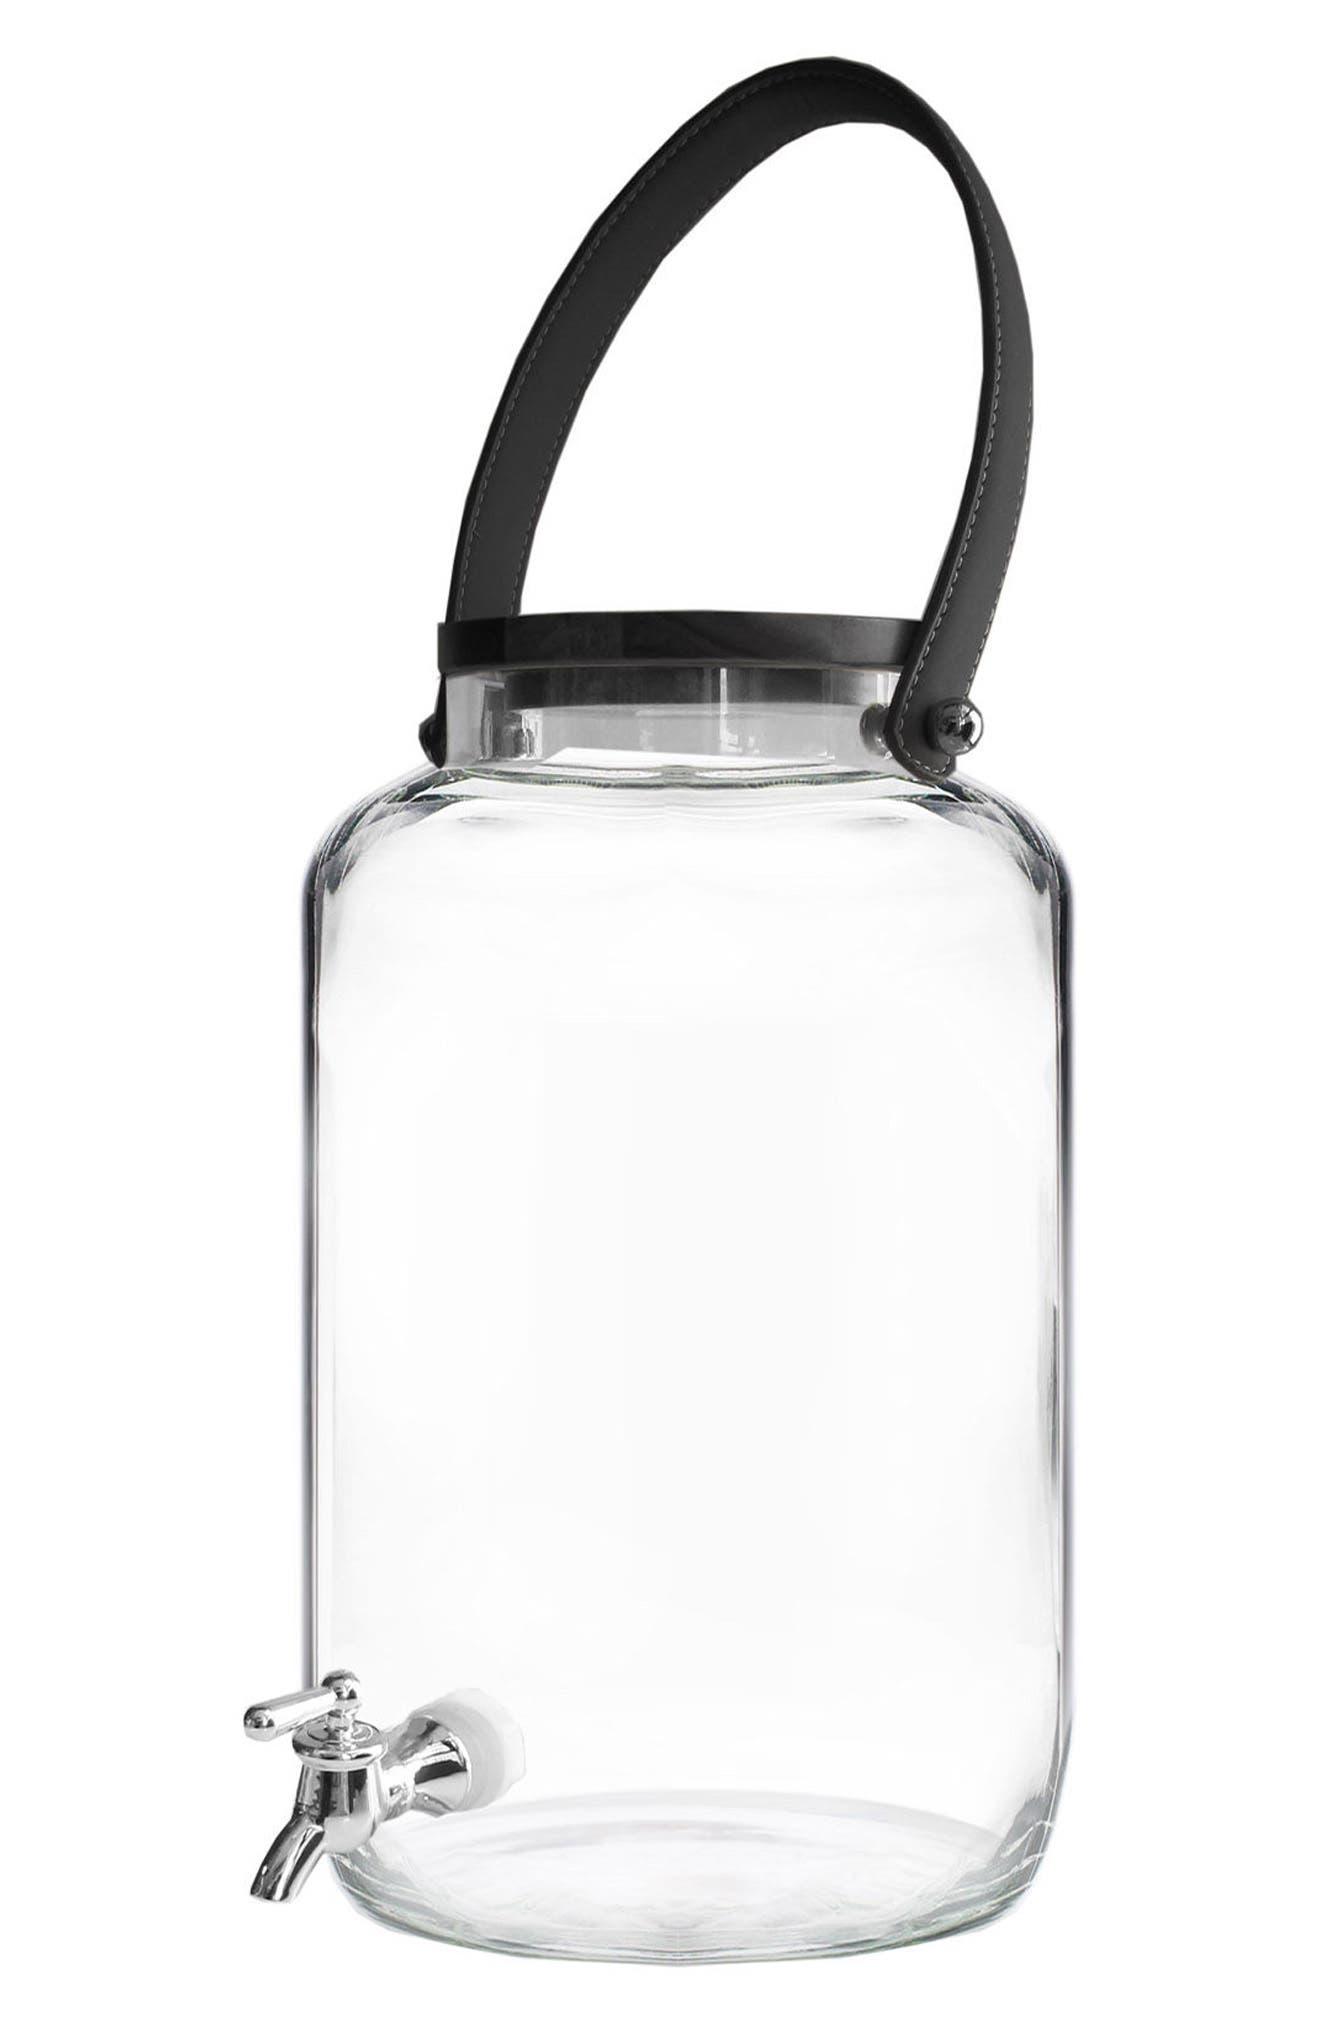 Kent 2-Gallon Beverage Dispenser,                             Alternate thumbnail 2, color,                             100